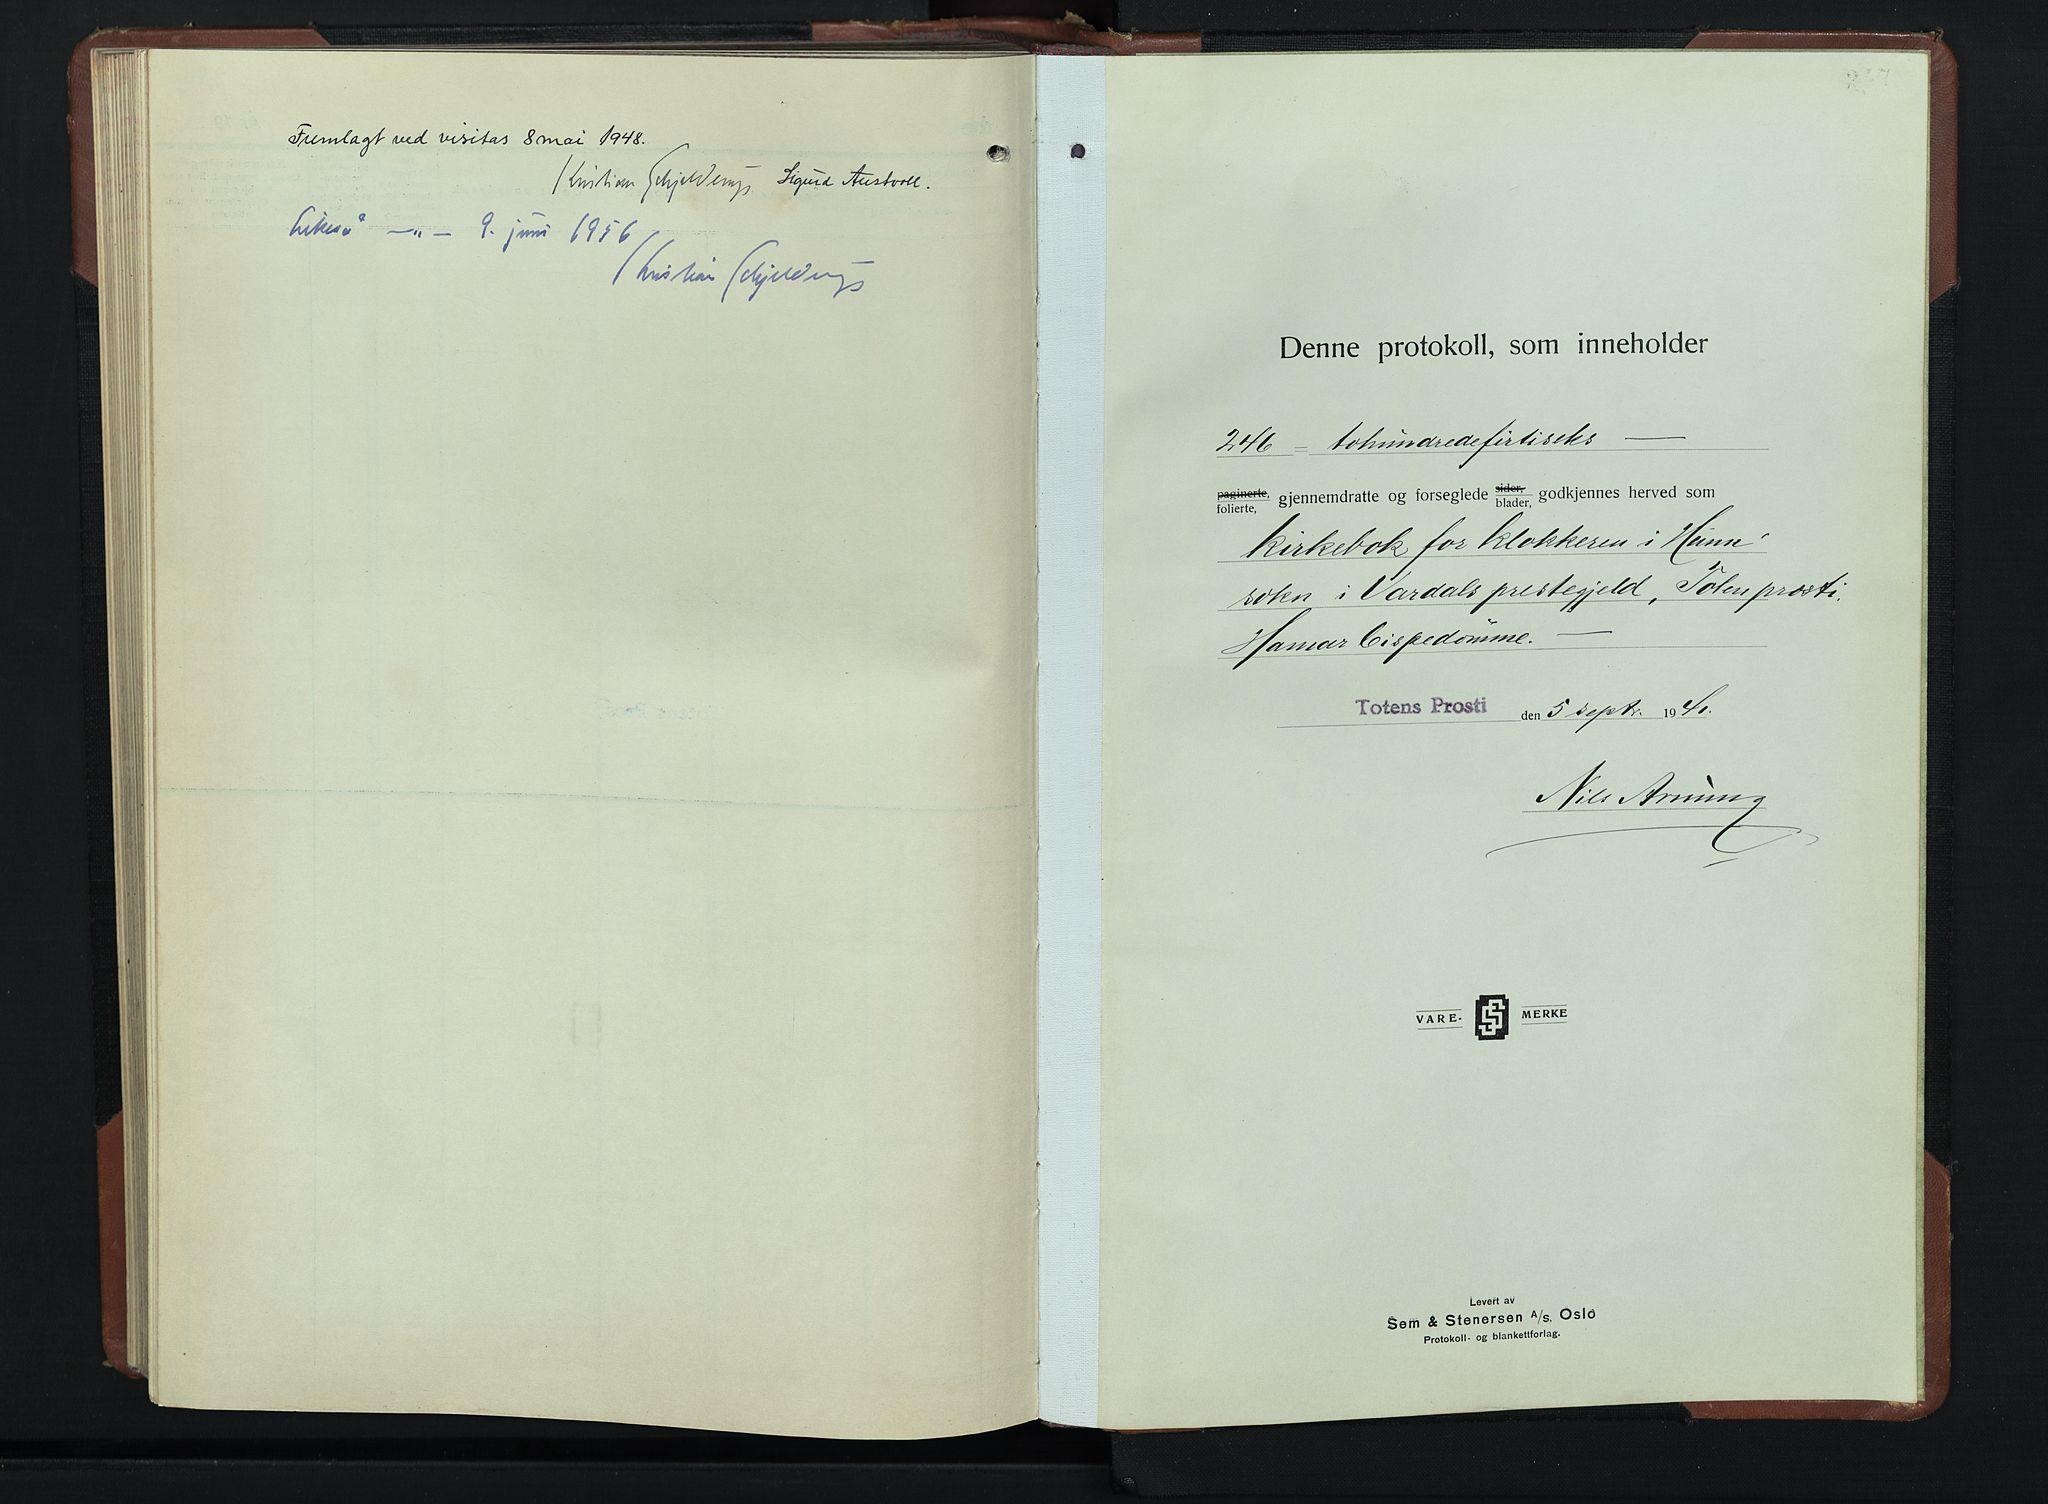 SAH, Vardal prestekontor, H/Ha/Hab/L0019: Klokkerbok nr. 19, 1941-1951